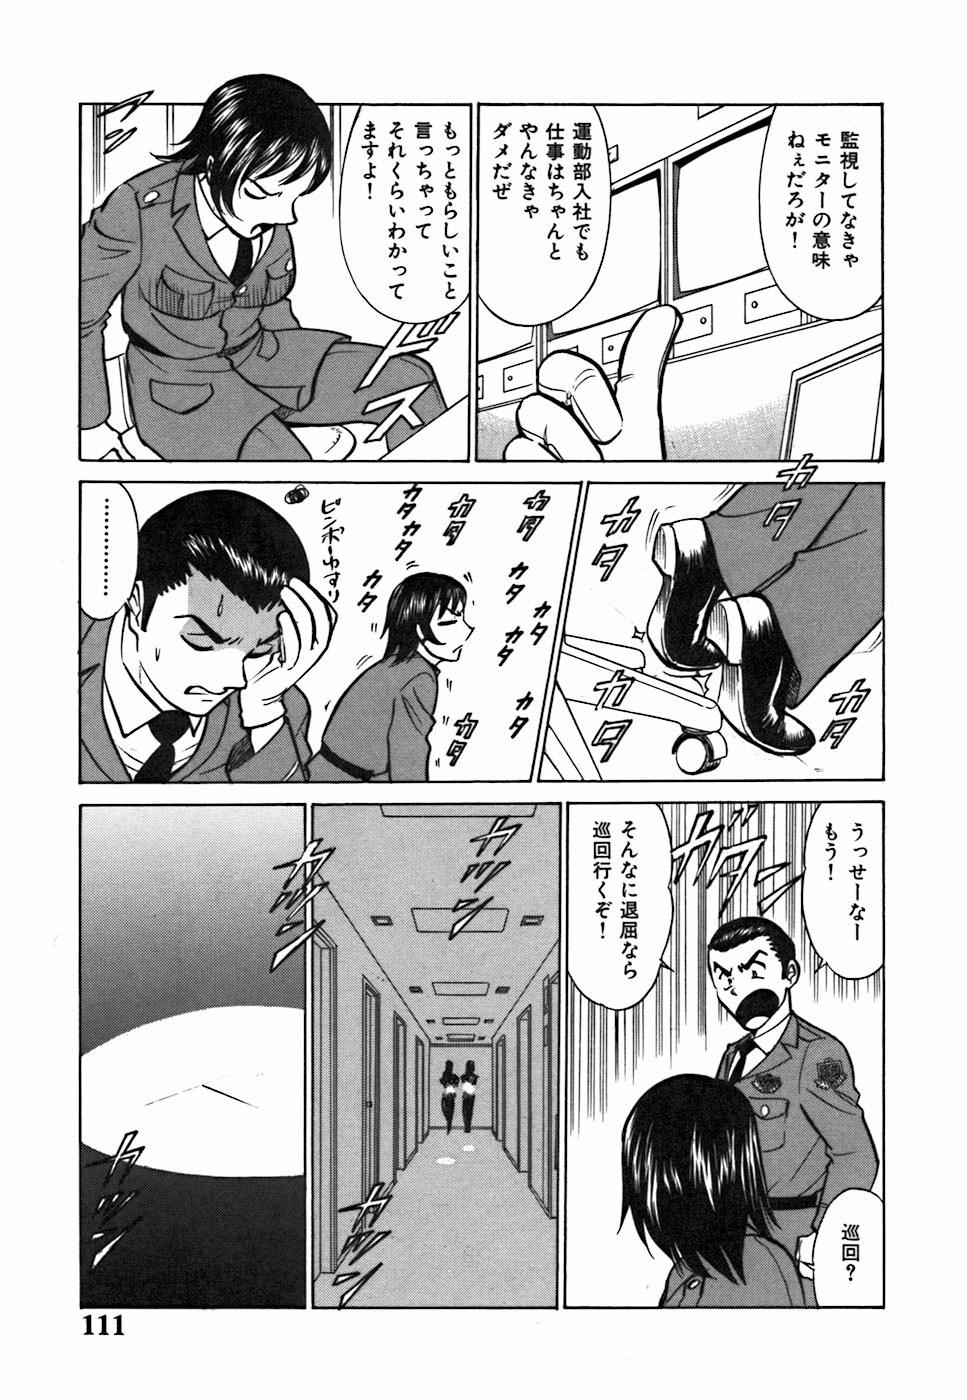 Kimi ga Nozomu Katachi | Appearance for which you hope 110